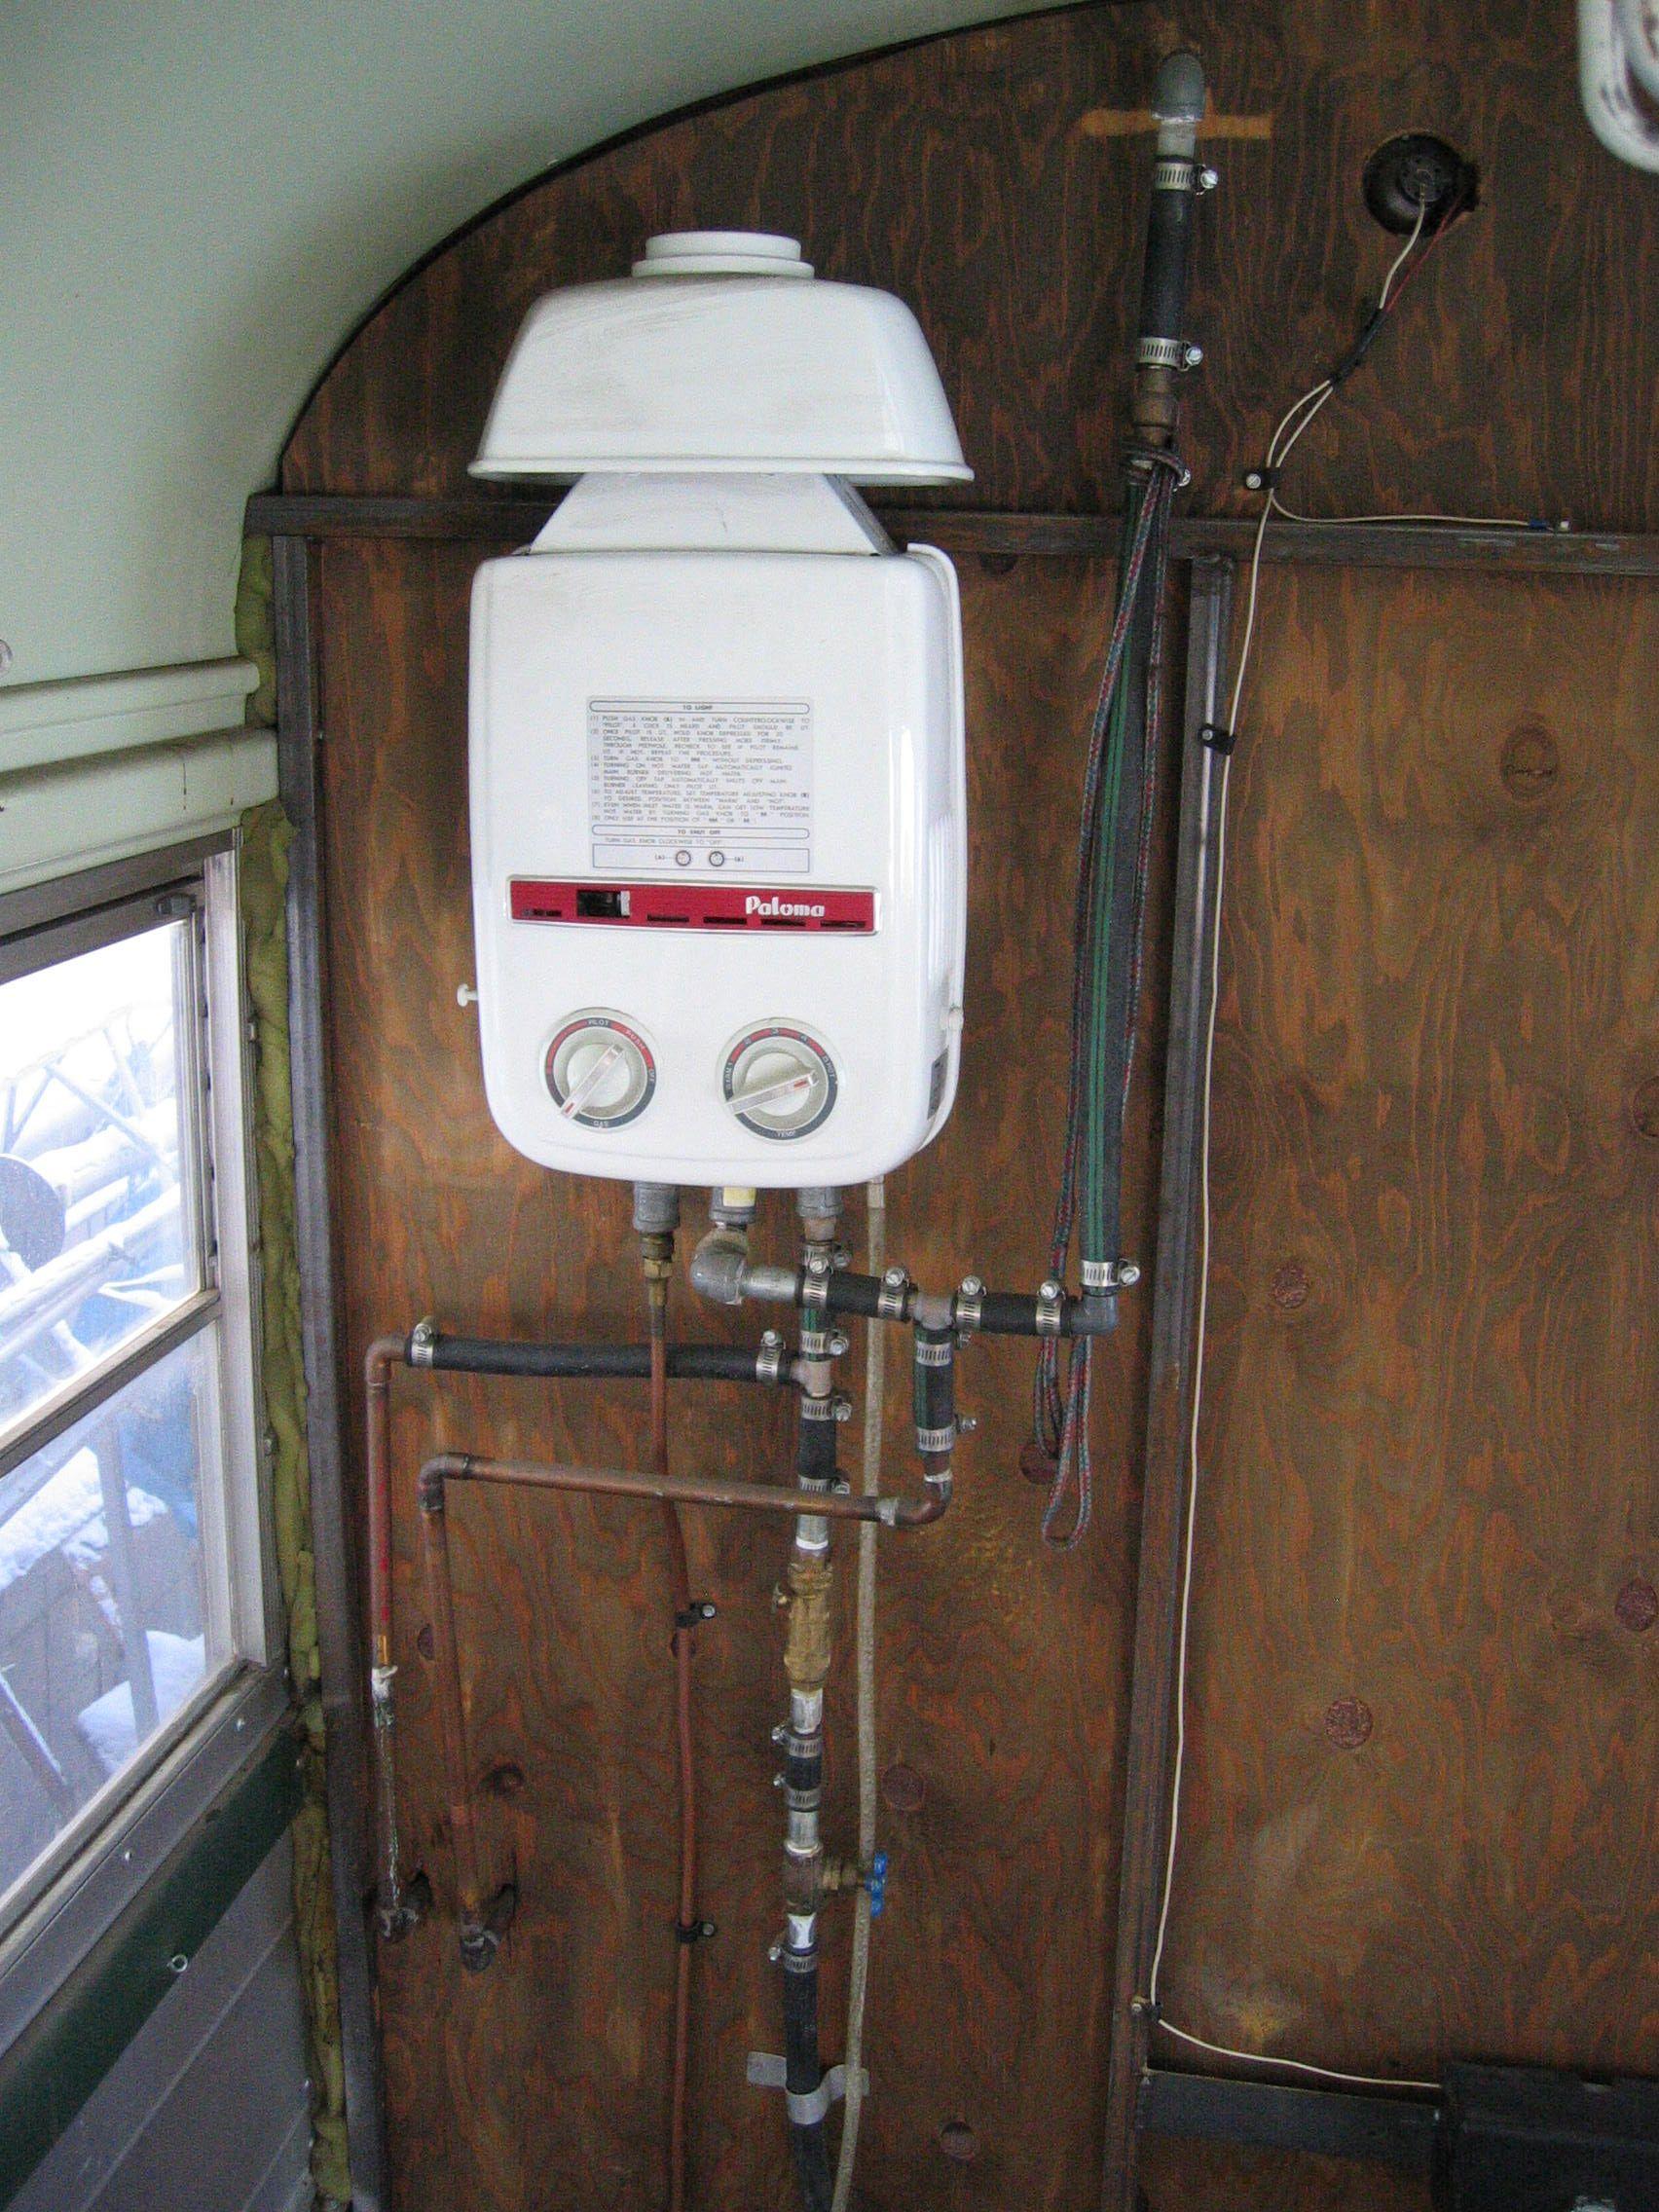 On demand water heater on demand water heater camper